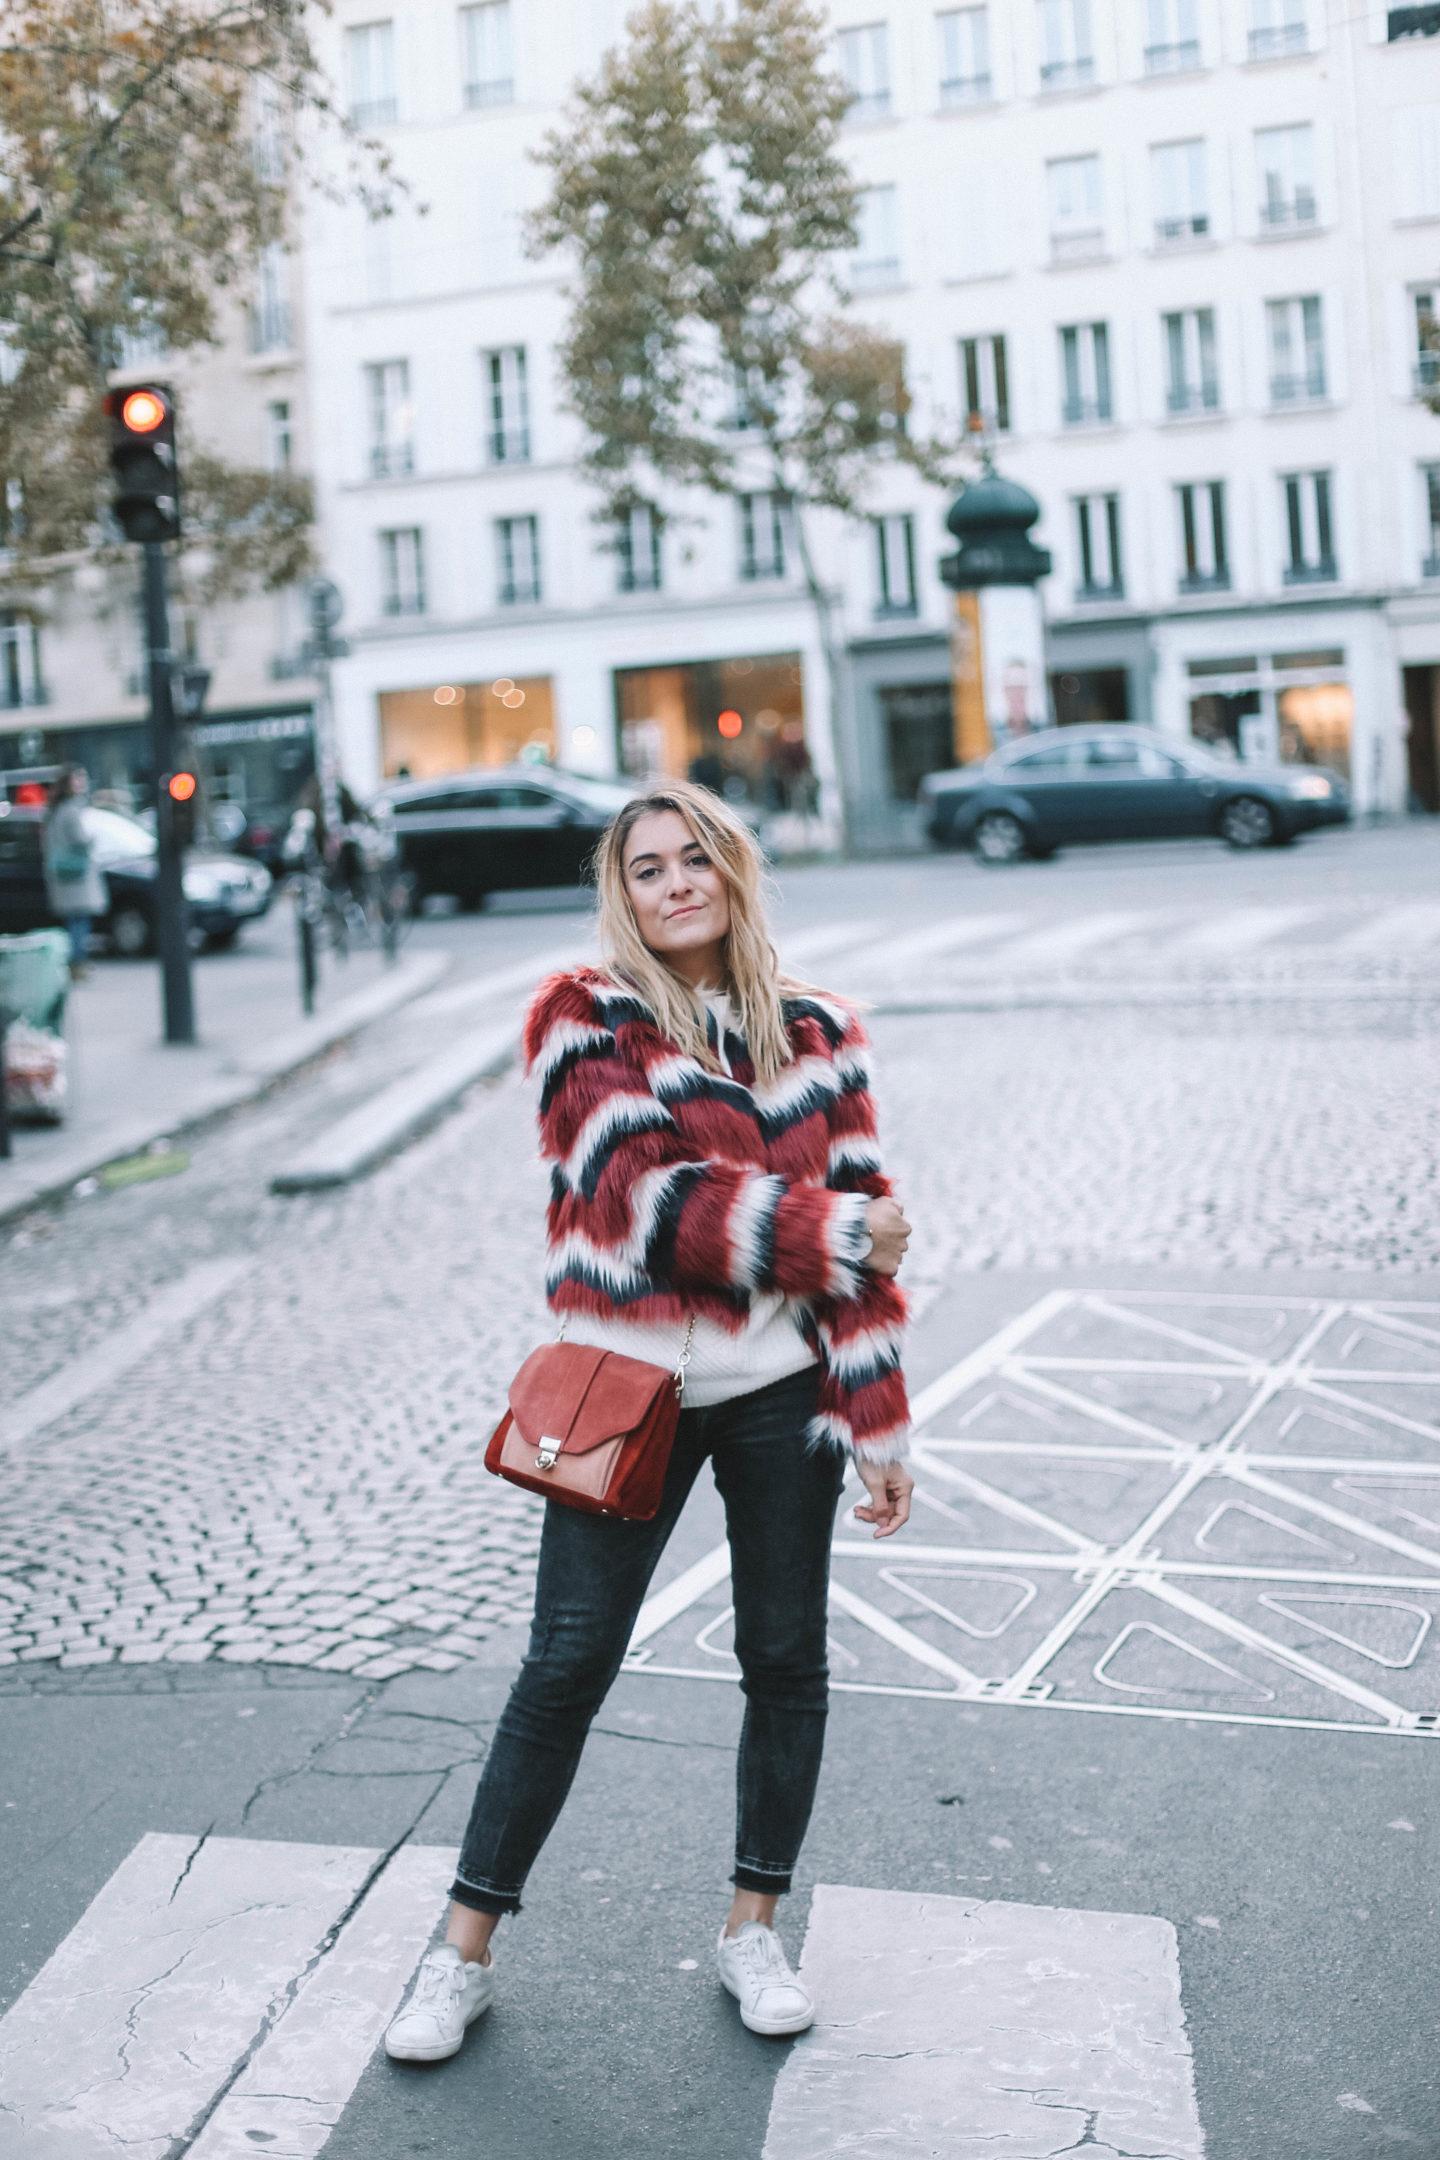 Fausse Fourrure Revolve Clothing - Blondie Baby blog mode et voyages